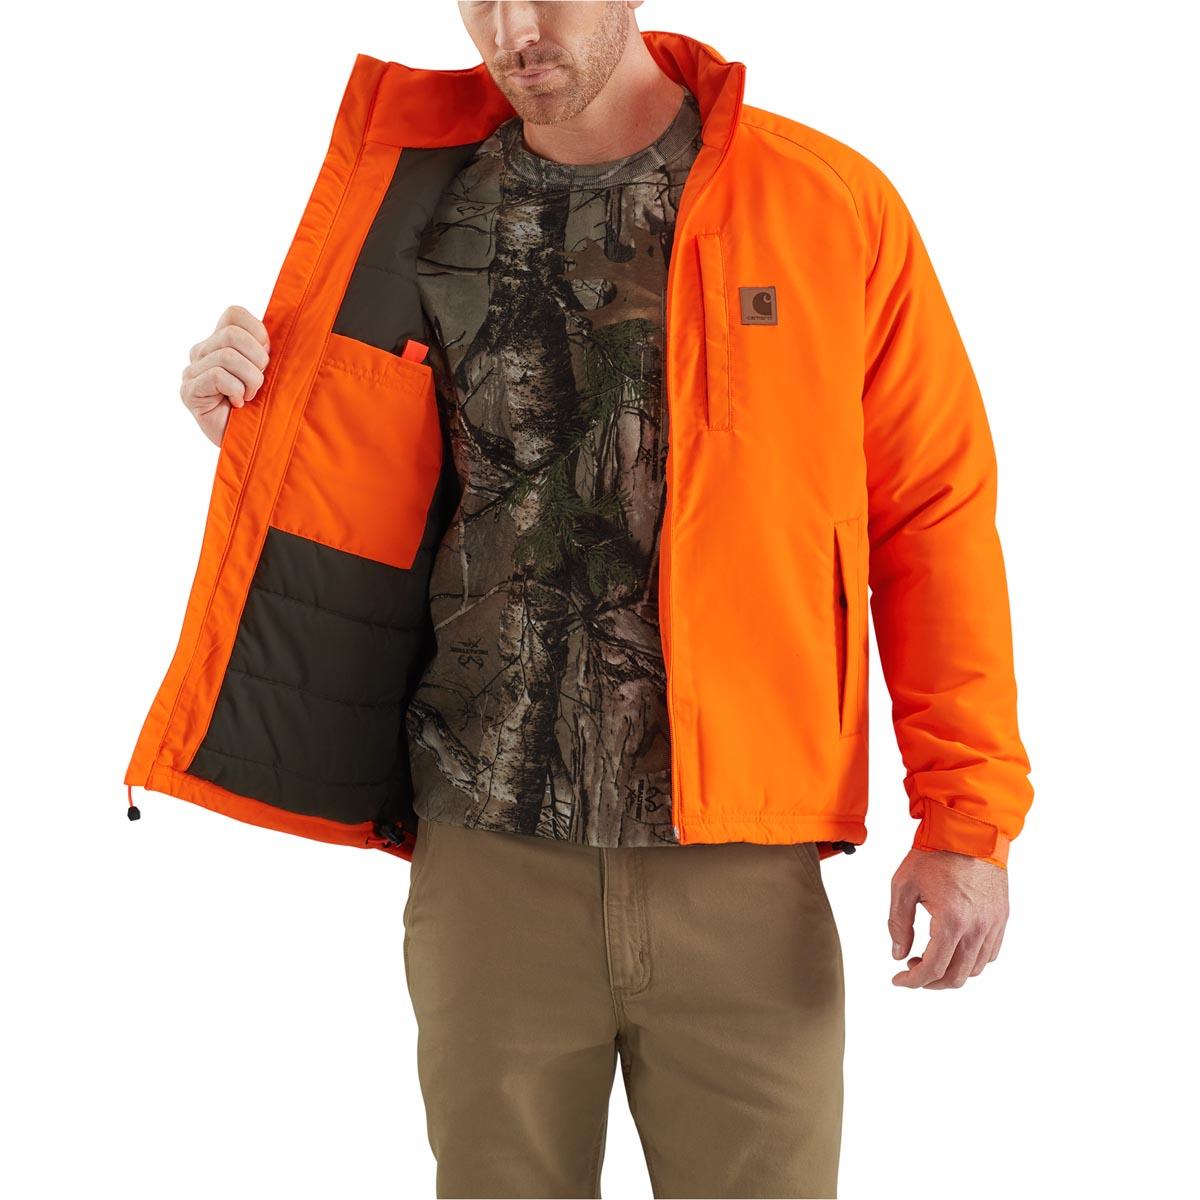 Carhartt Men's 8 Point Jacket